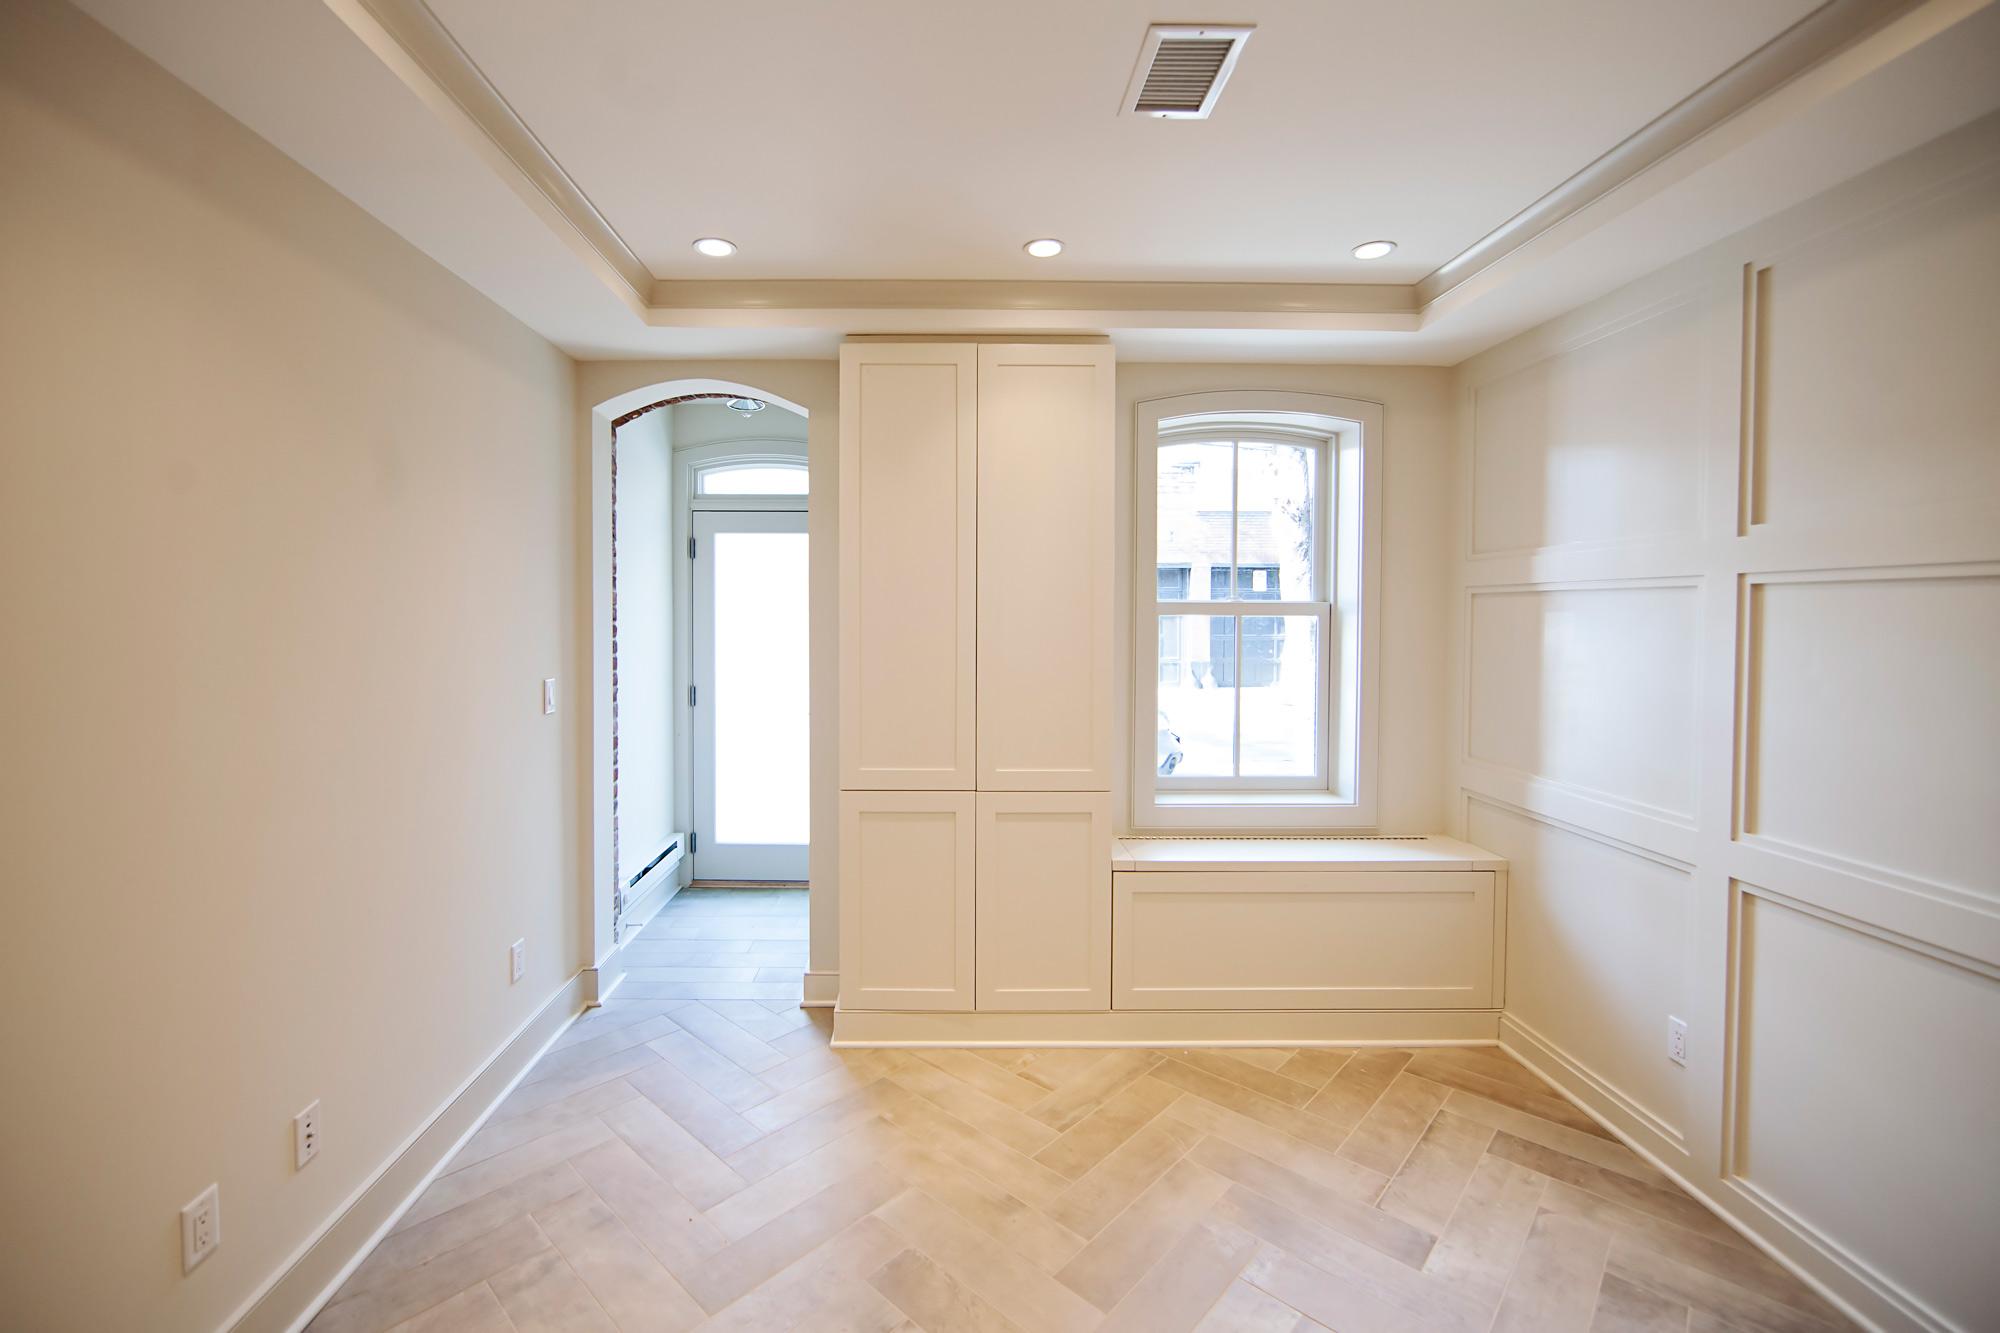 thompson-fine-home-renovations-hoboken-new-jersey-construction-1.jpg